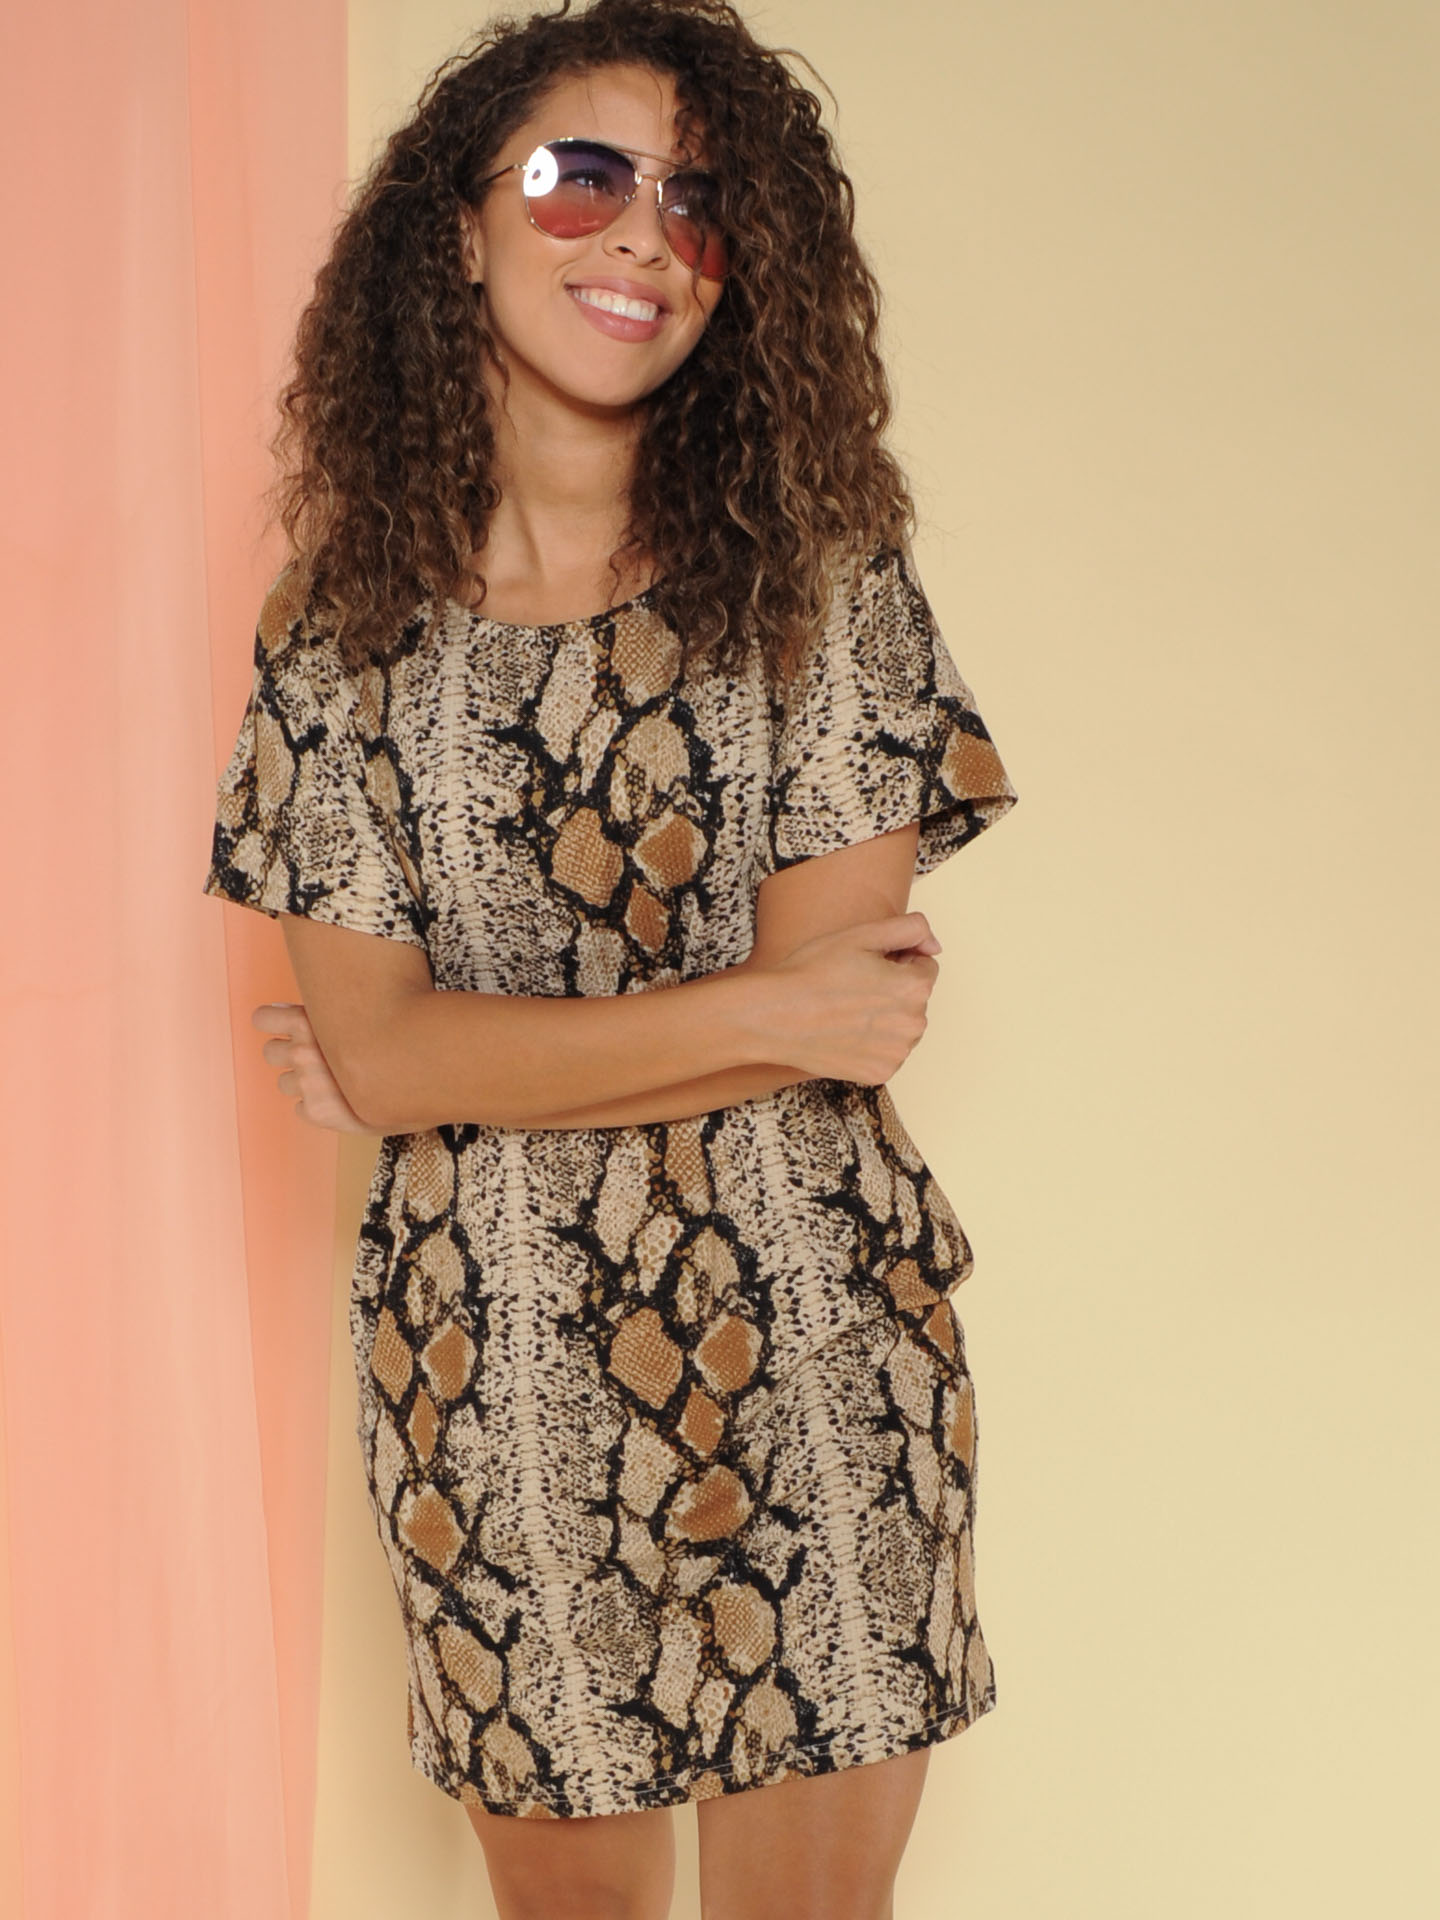 Viper Dress Pocketed Snake Print Tee Dress